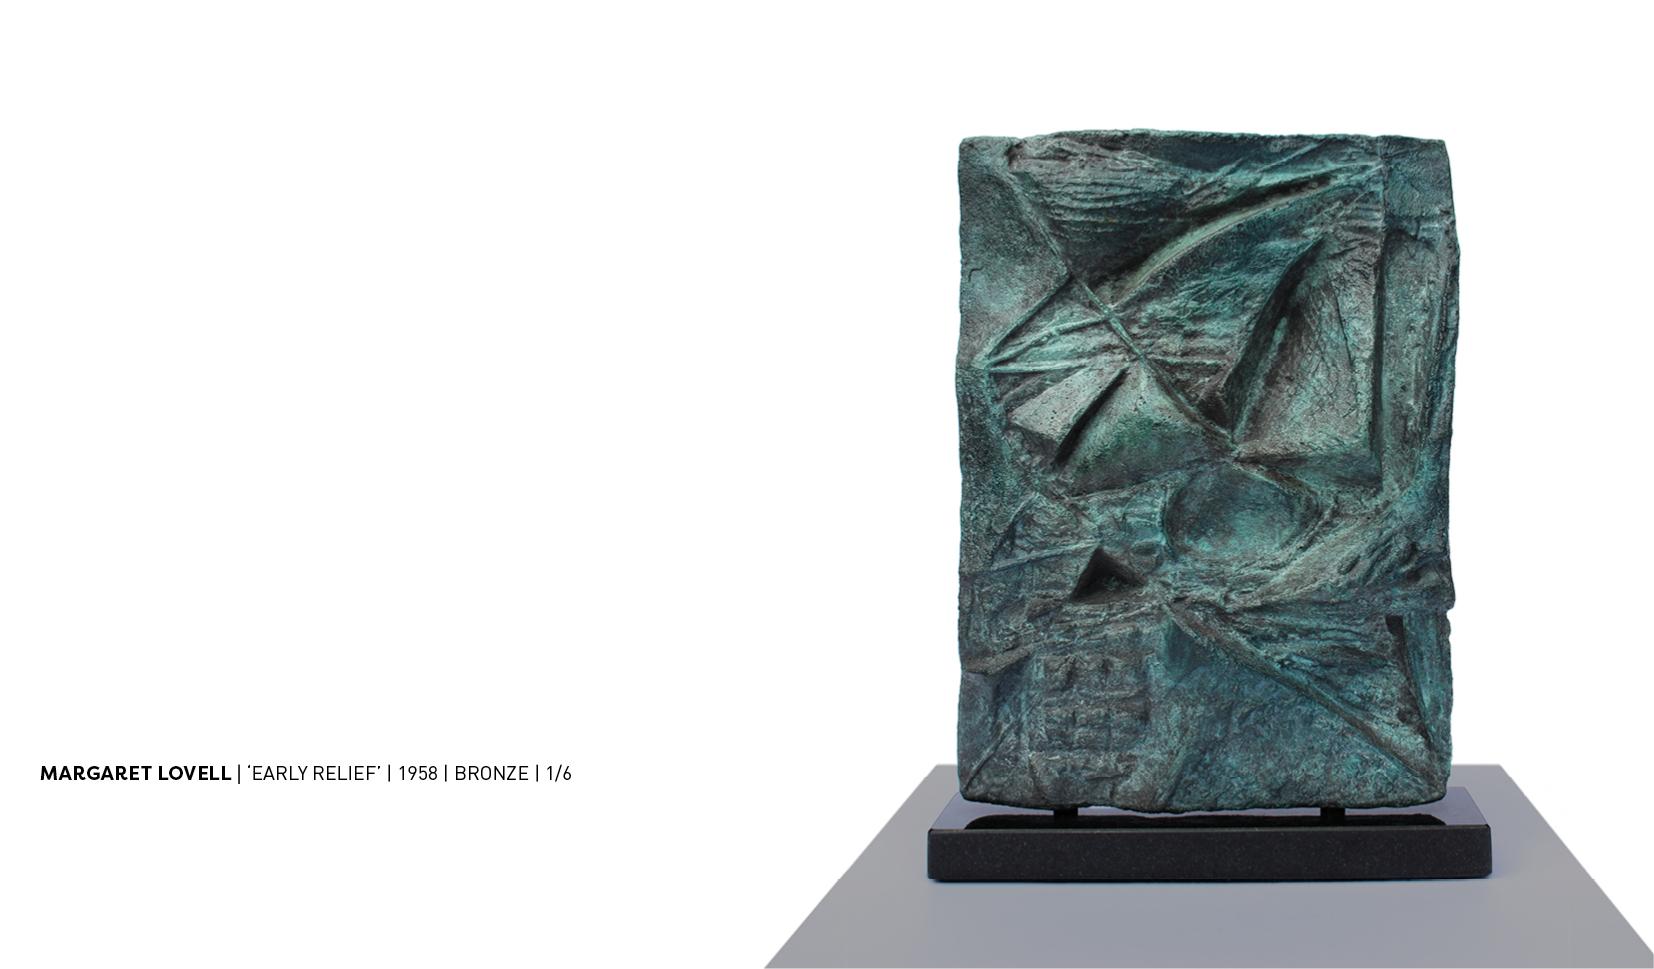 magraret lovell bronze relief